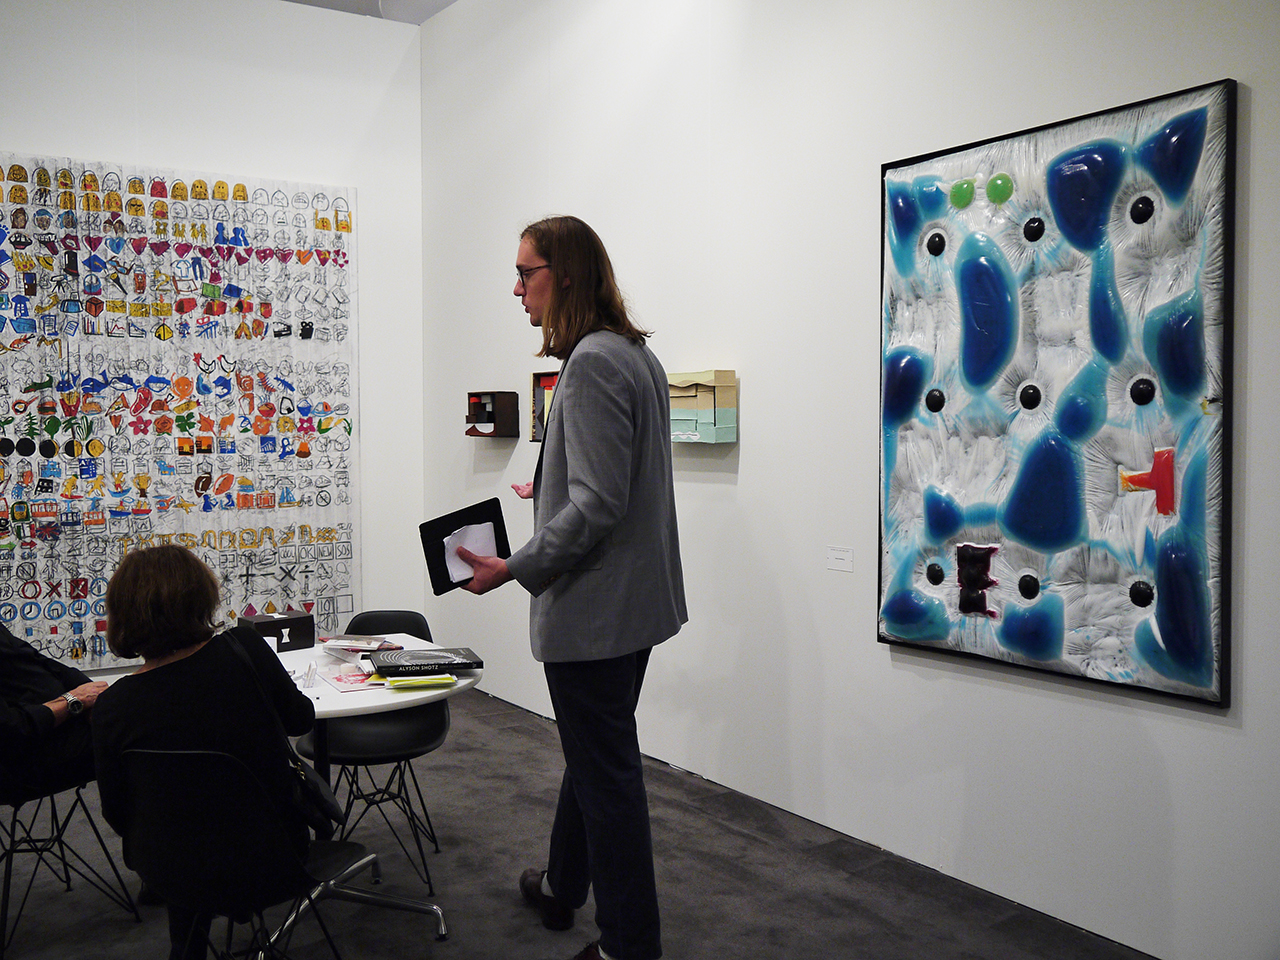 Work by Jesse Greenberg at Derek Eller Gallery